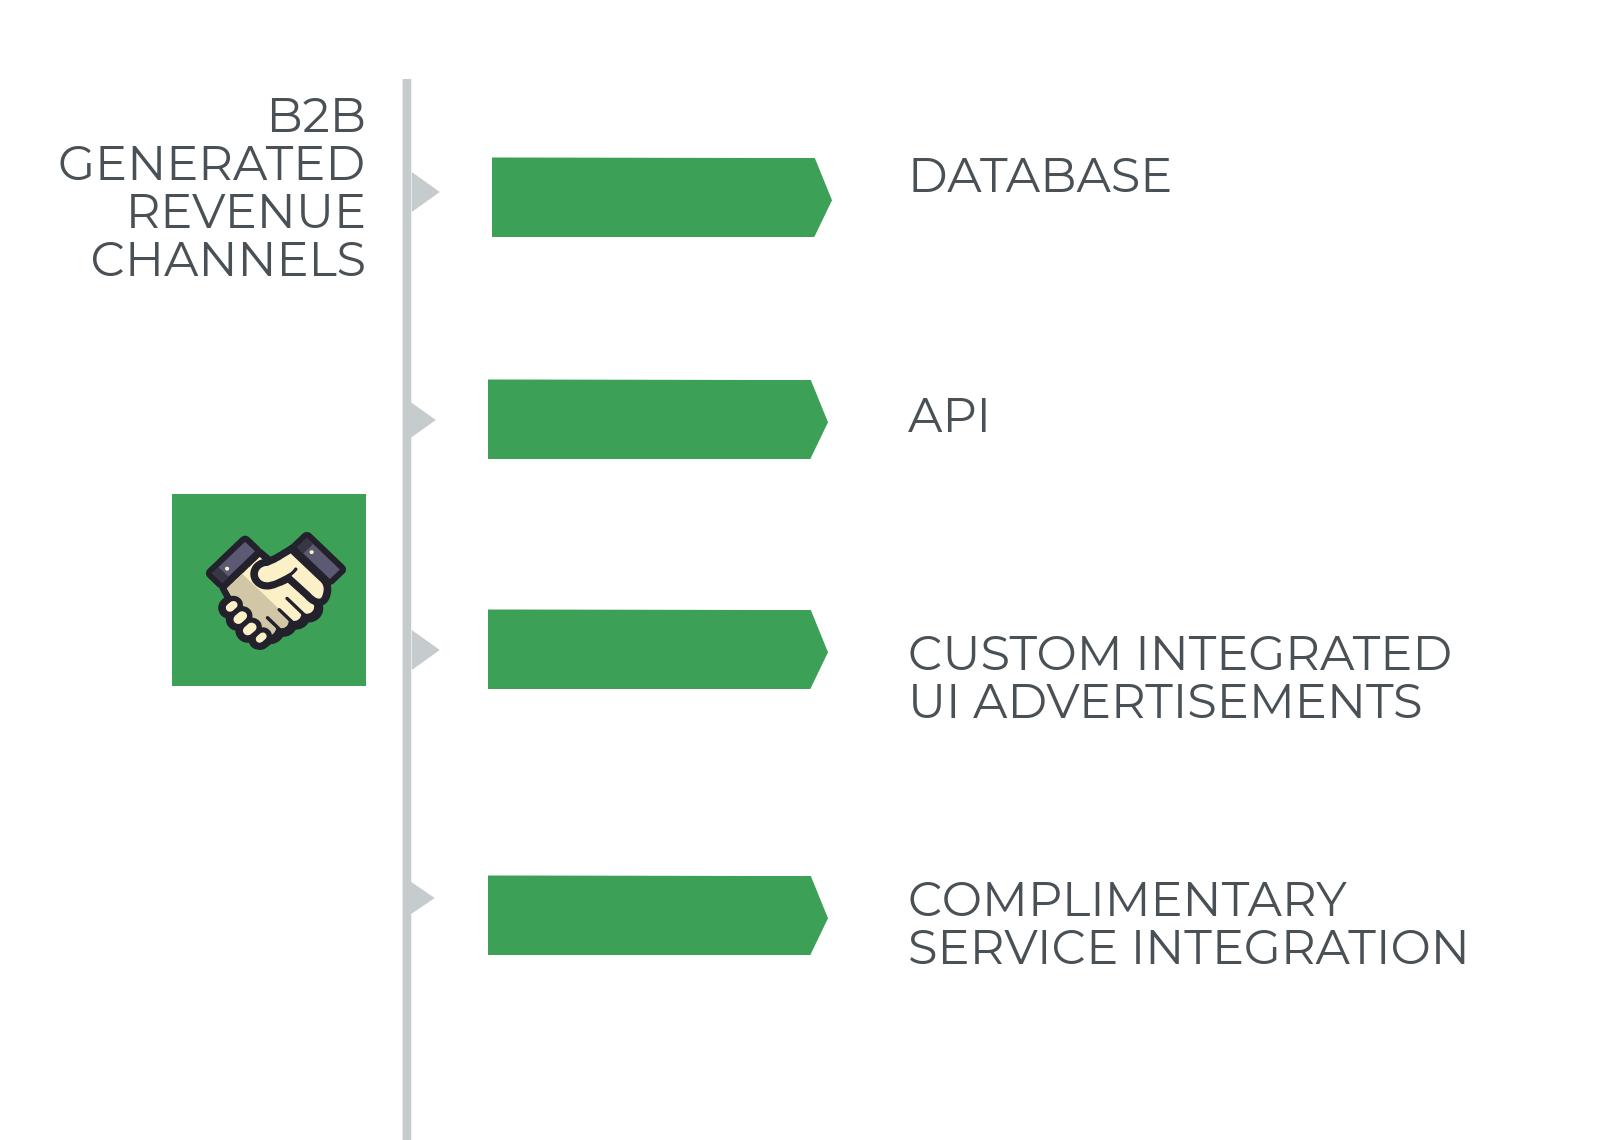 B2B generated revenue